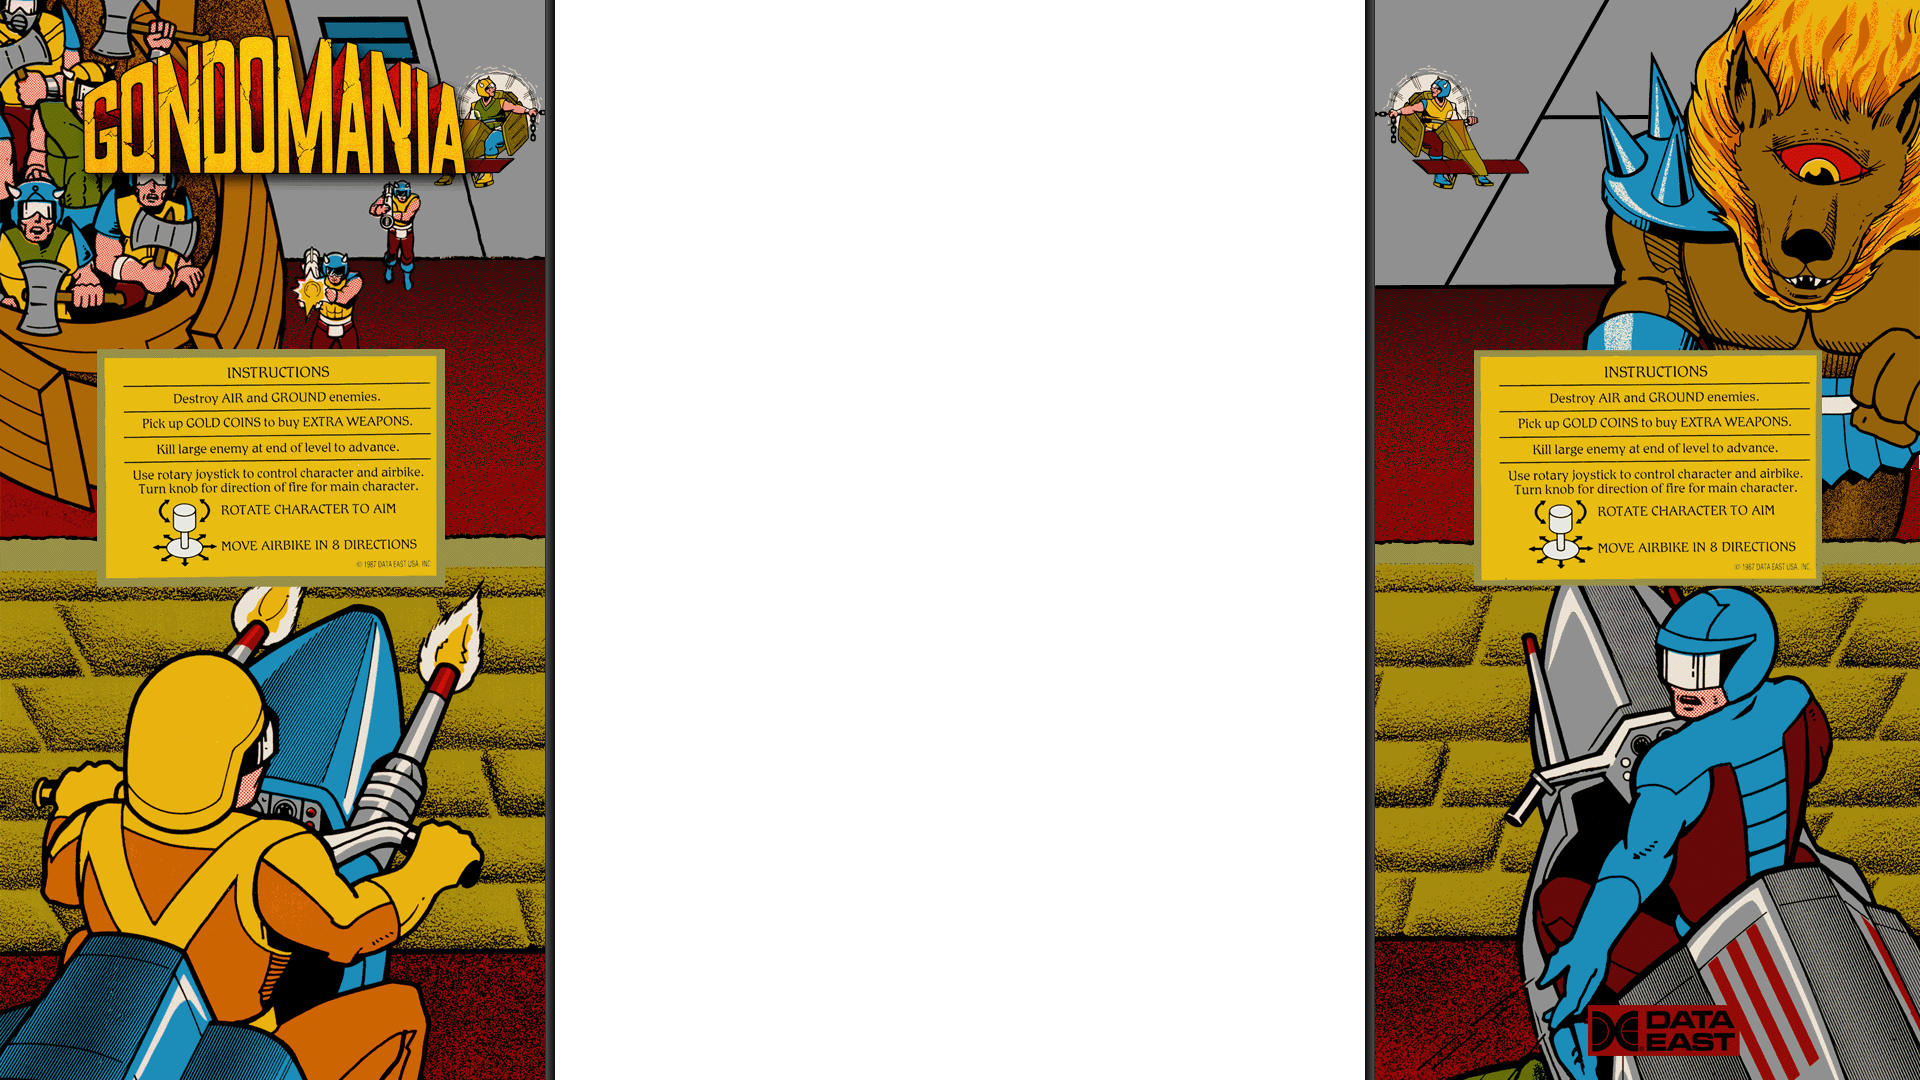 Gondomania 1080p overlay